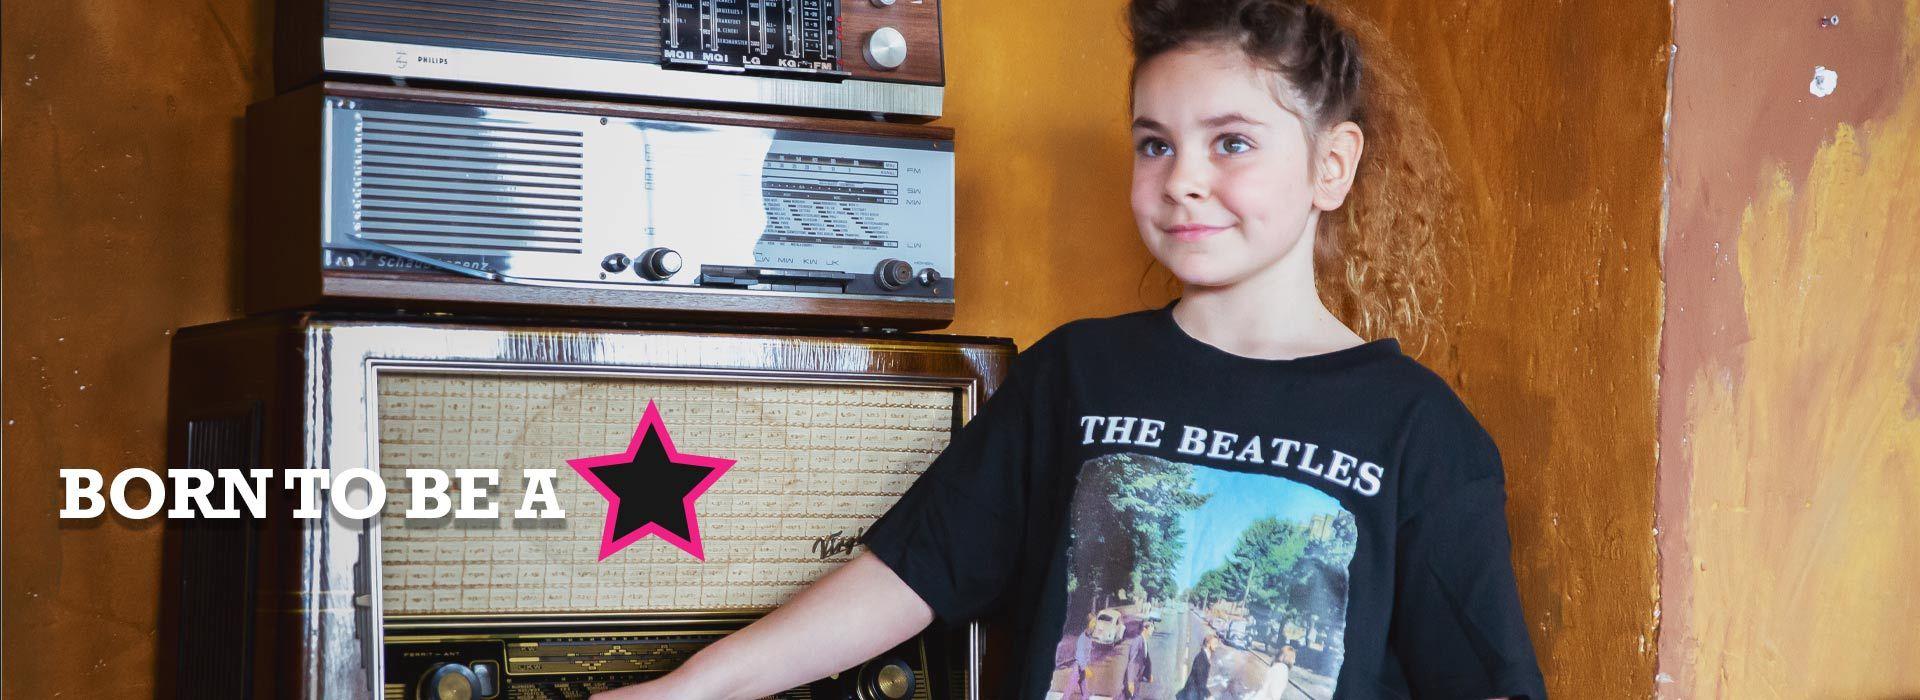 Rock børn tøj - The Beatles